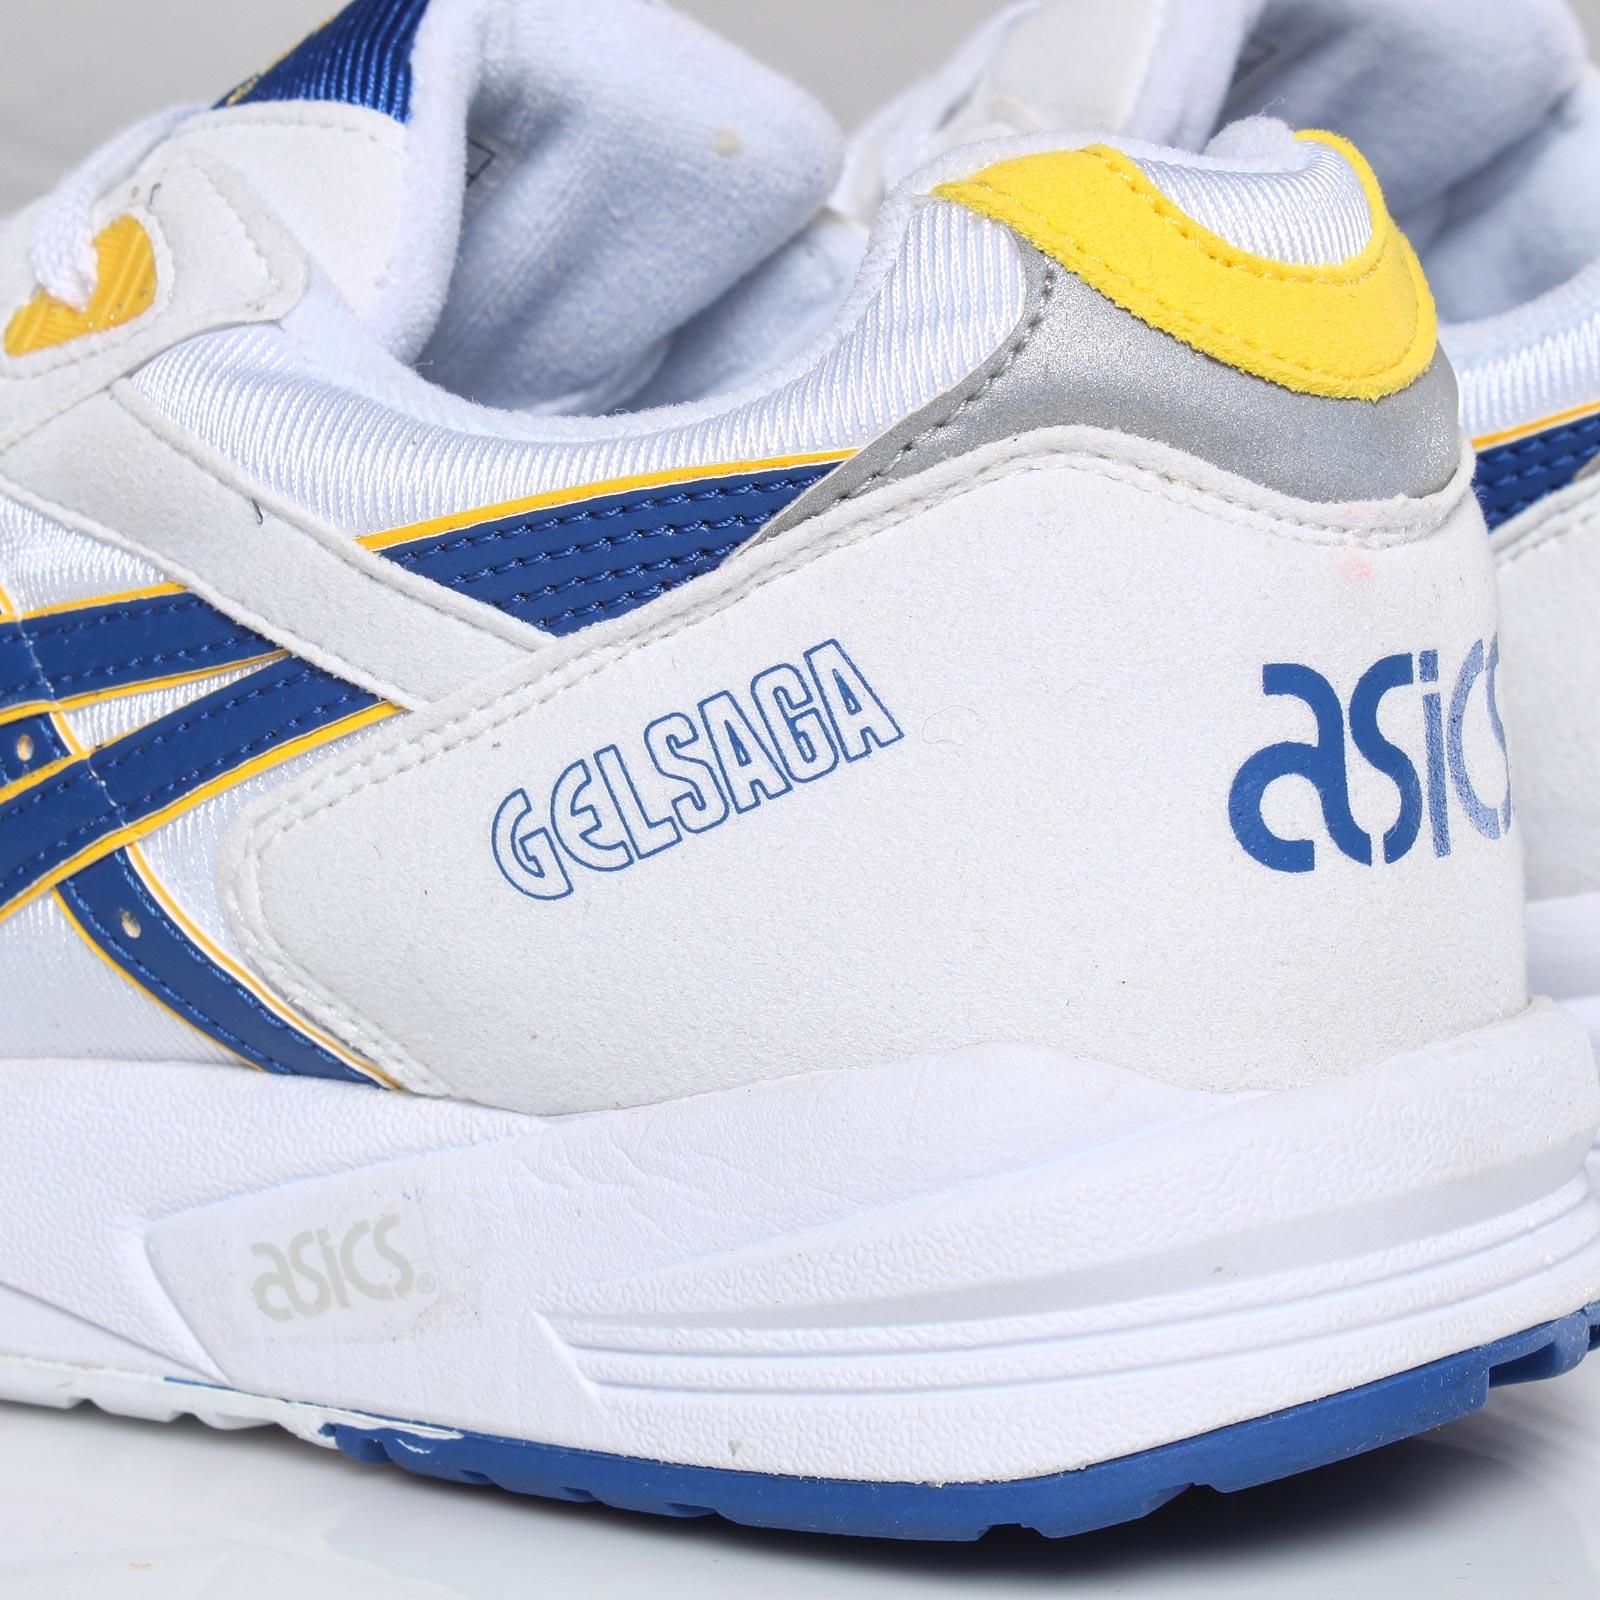 ASICS Tiger Gel Saga II - 102313 - Sneakersnstuff  304493a0031d